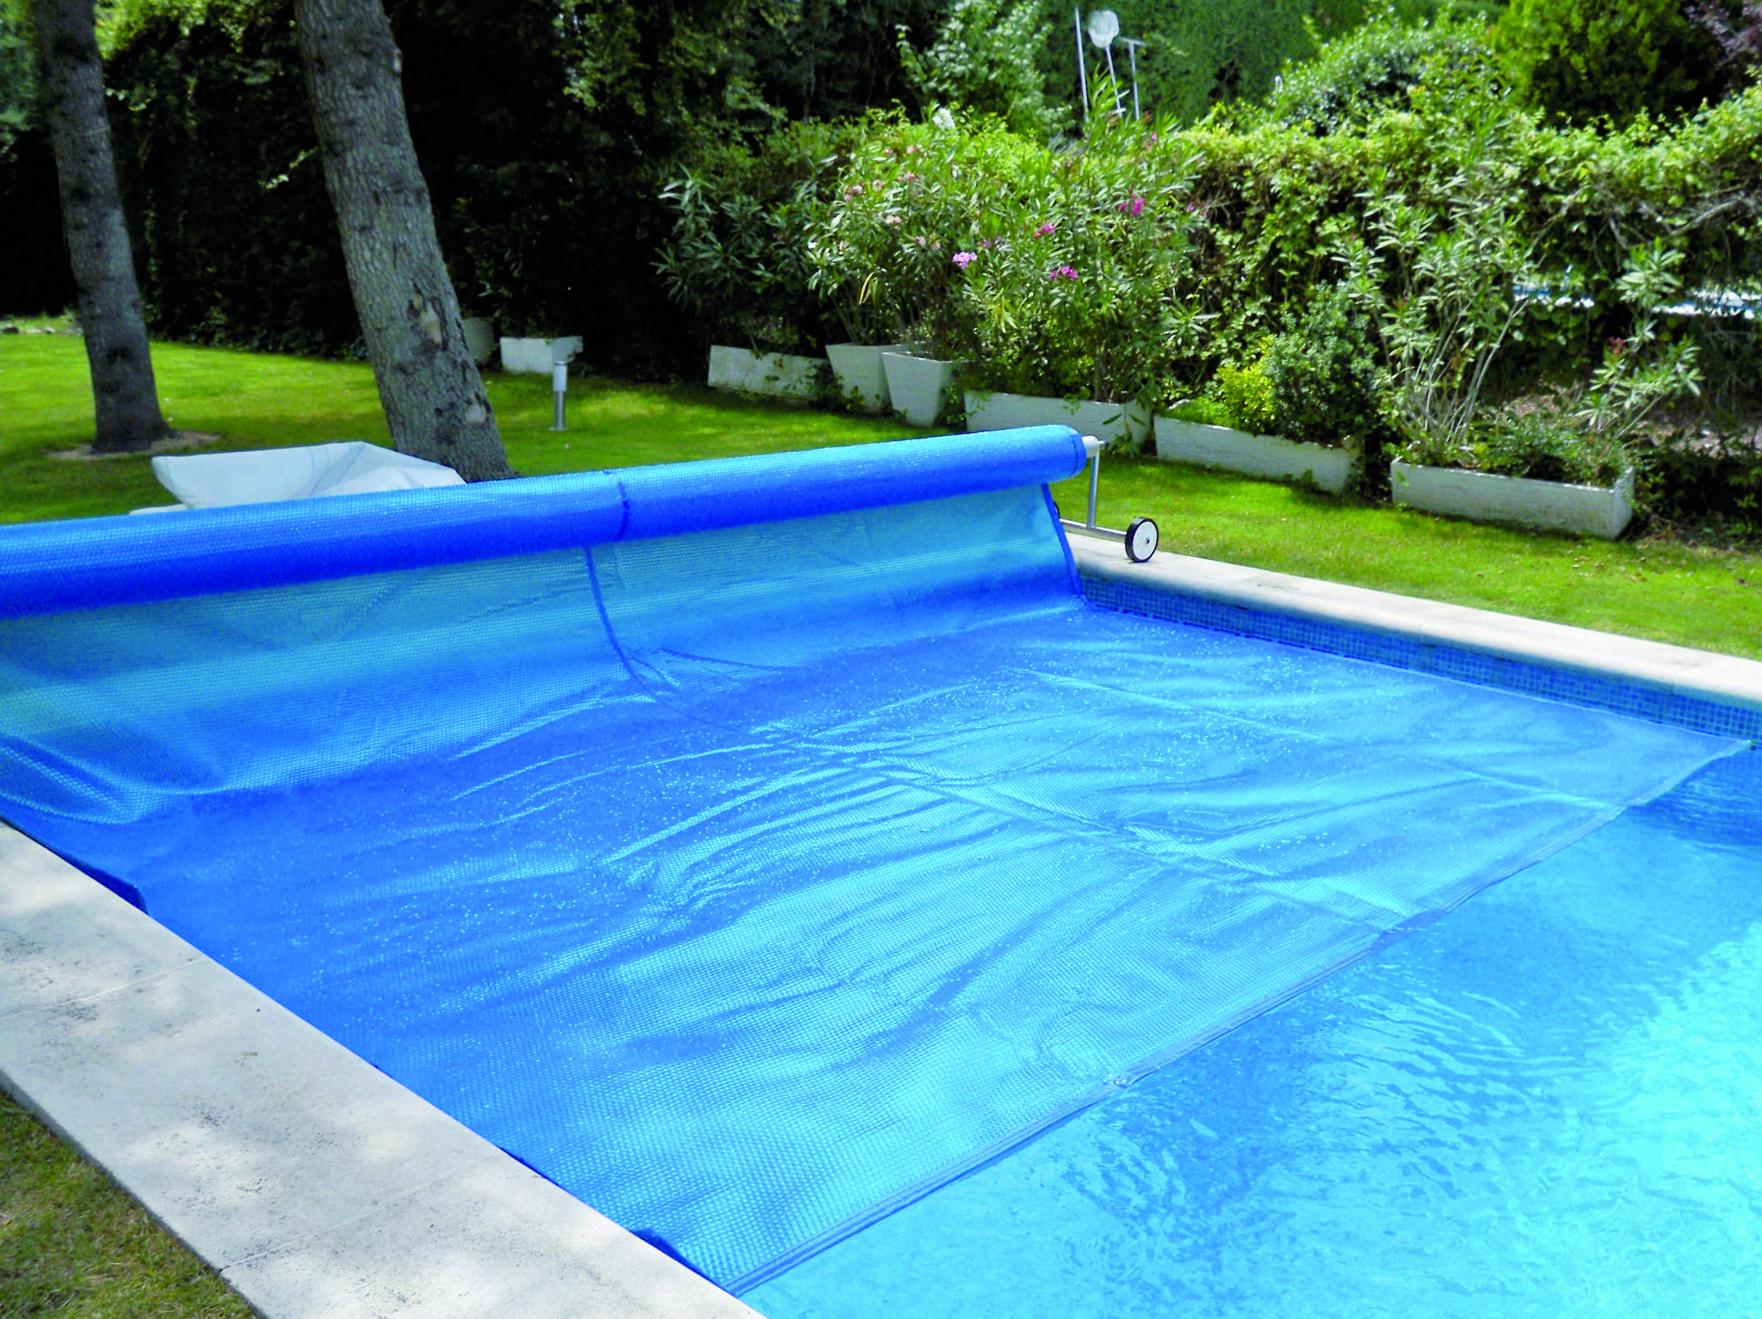 Lona enrollable para cubrir piscina